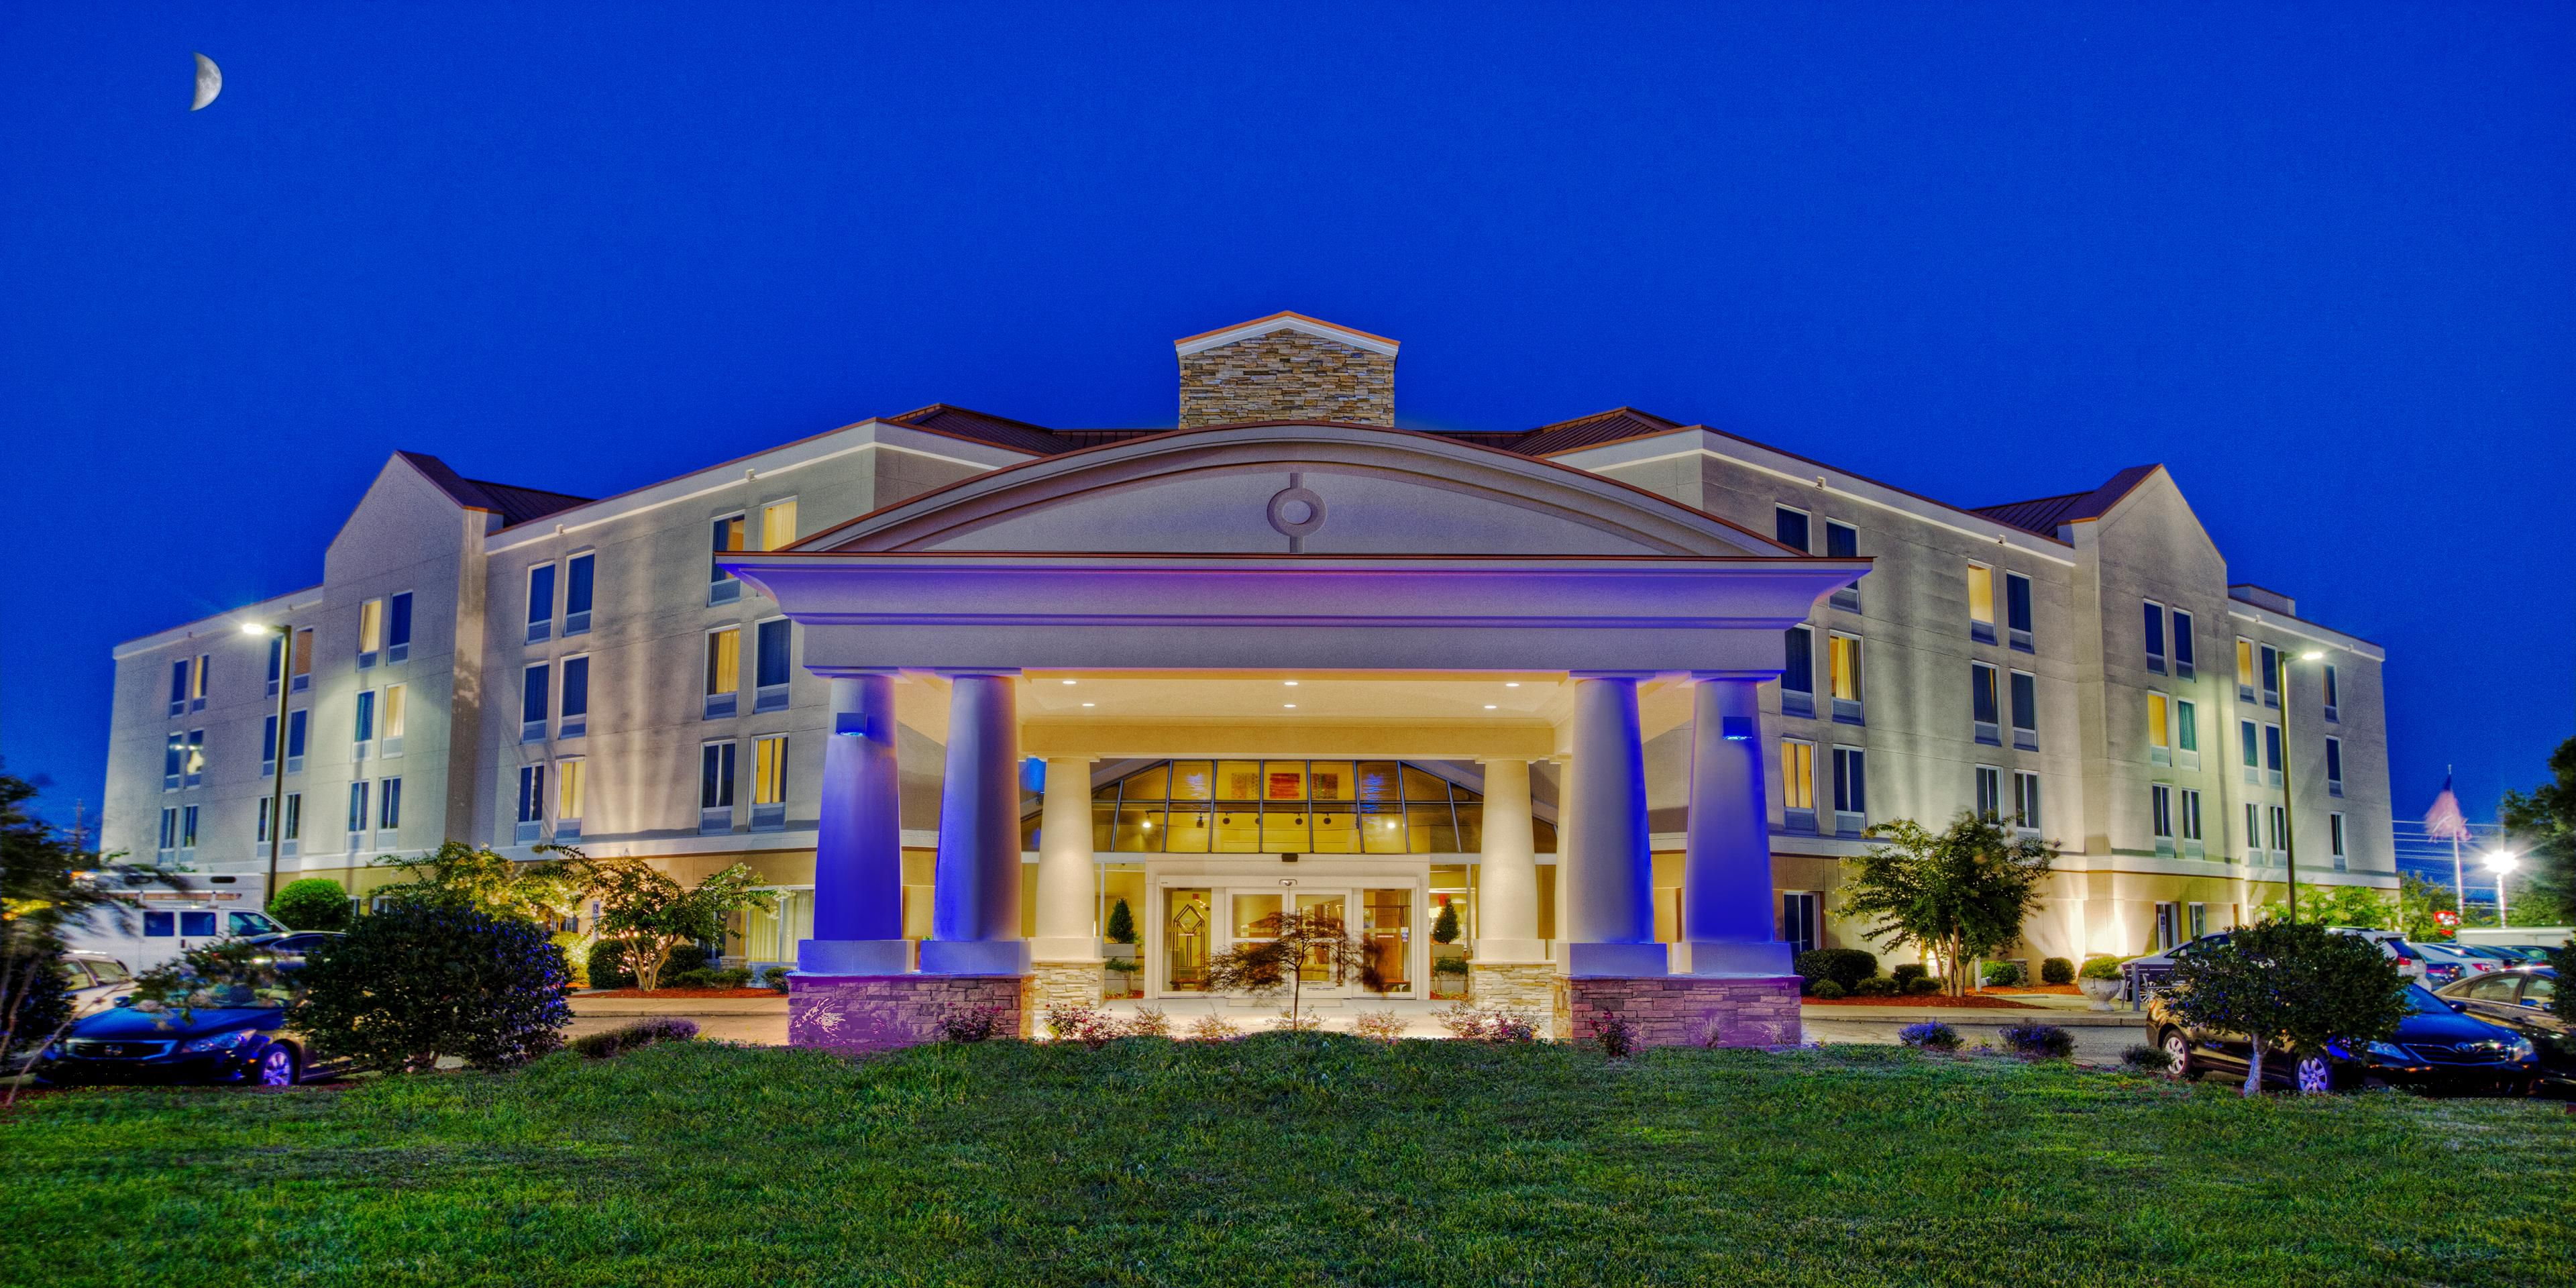 greenville nc hotel deals